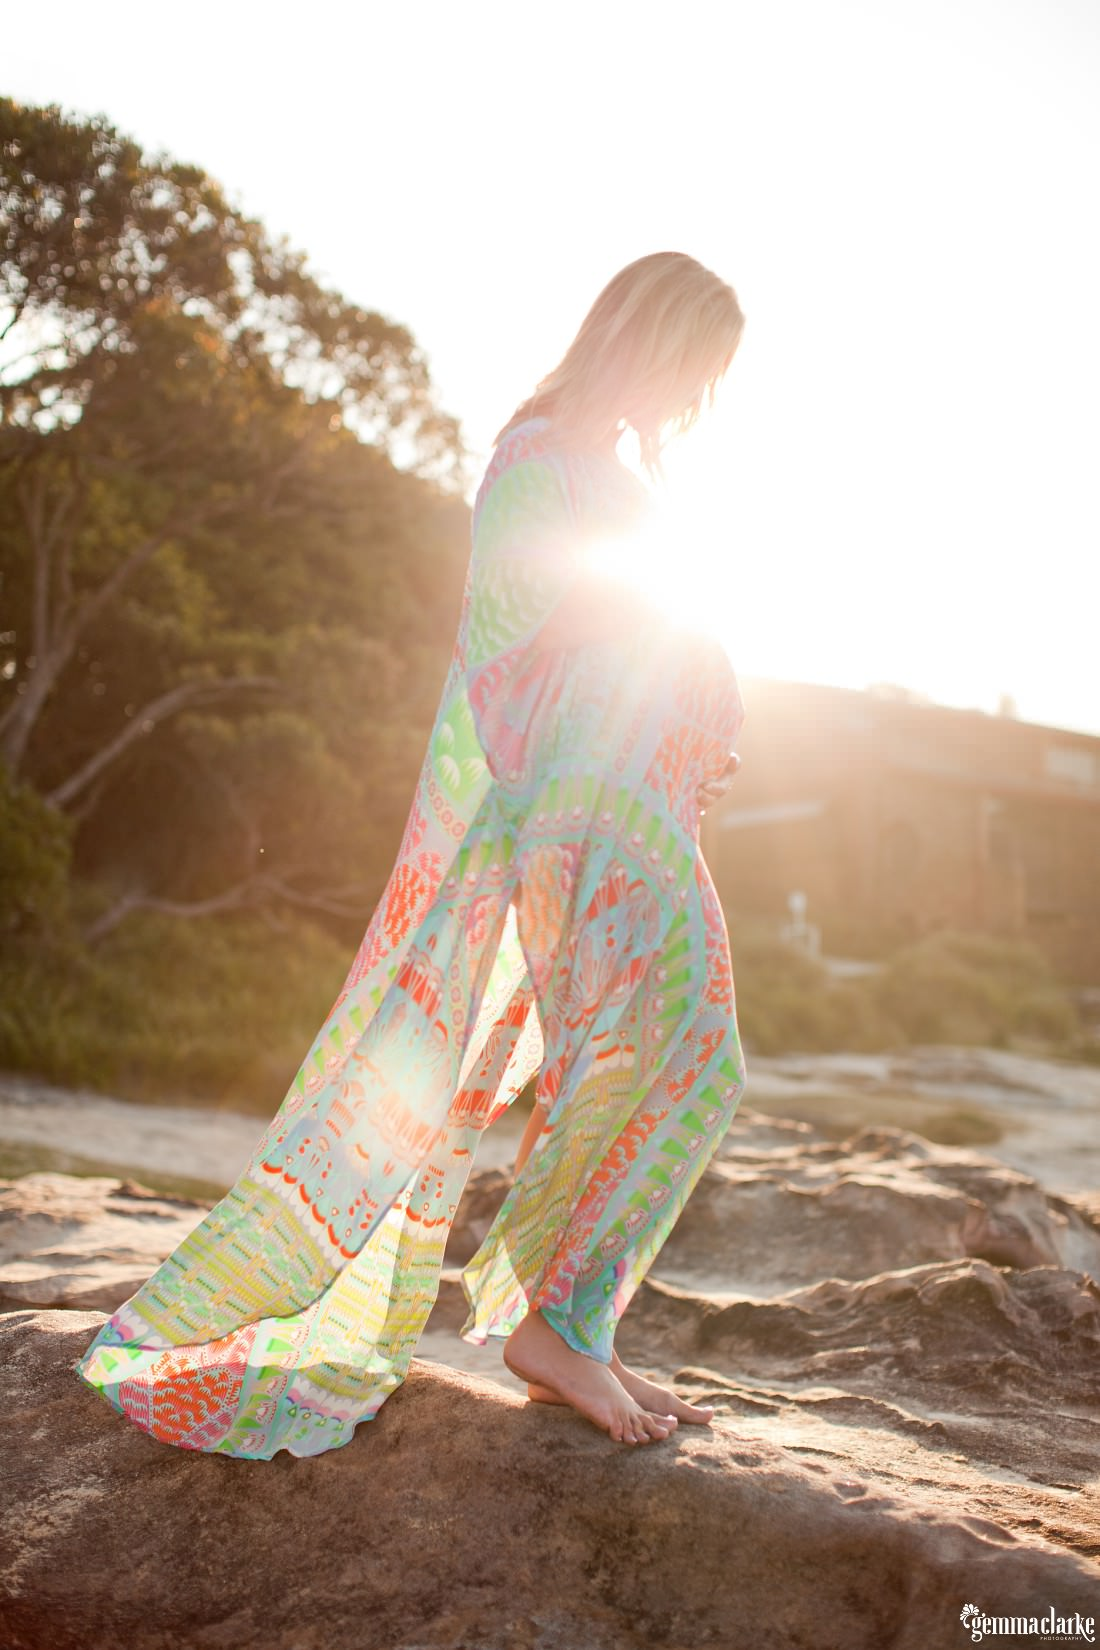 gemmaclarkephotography_lifestyle-pregnancy-photos-sydney_tamara-and-ross_0009a